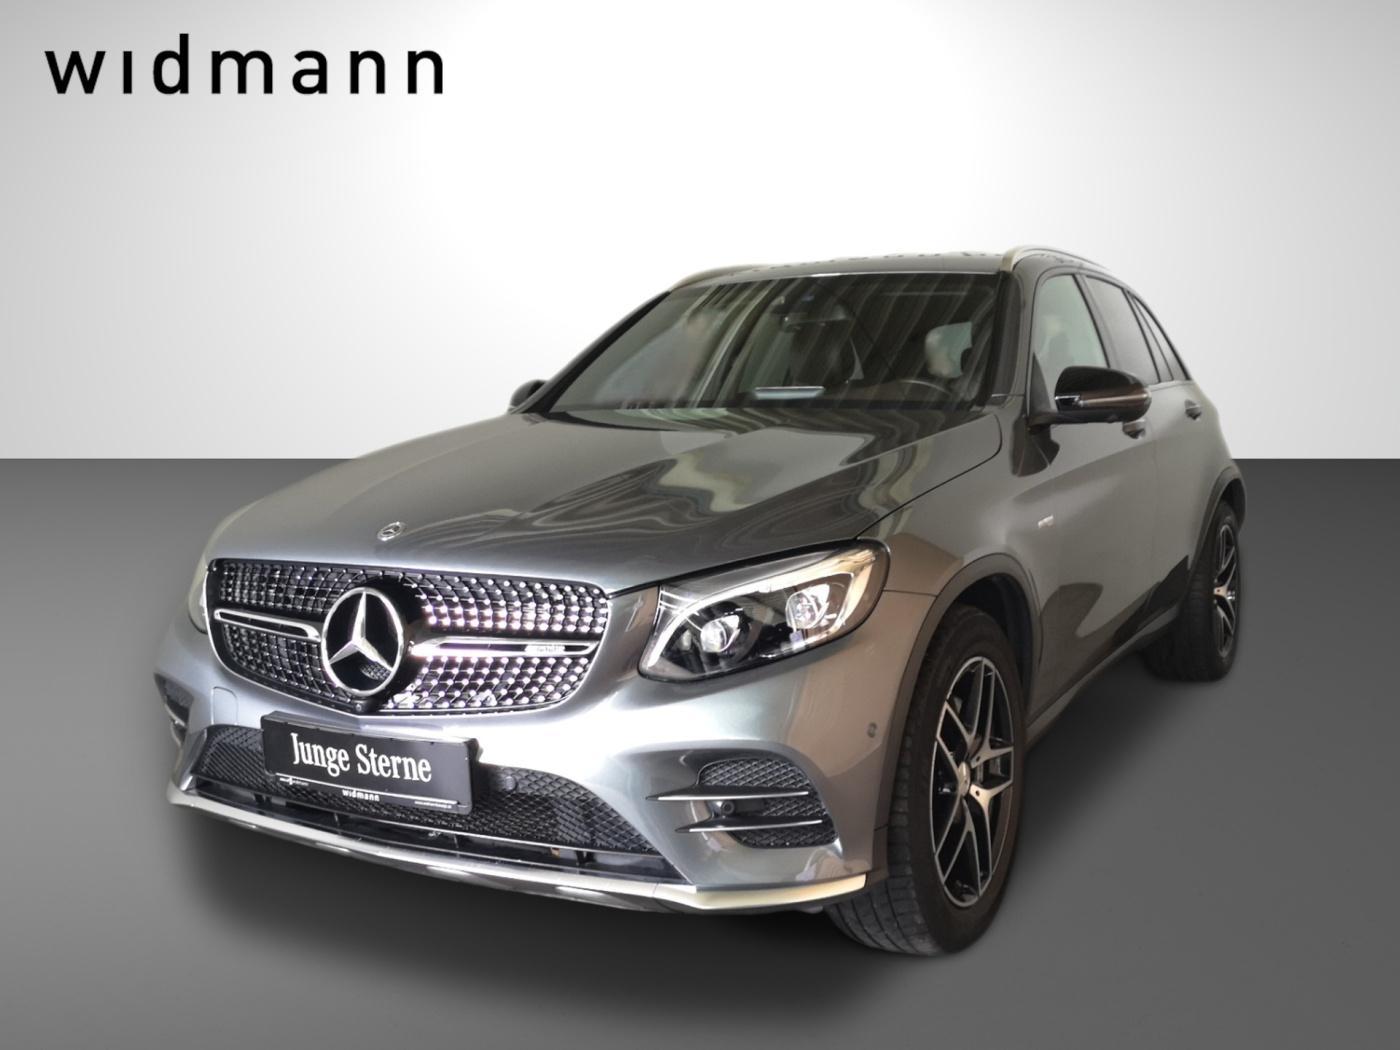 Mercedes-Benz GLC 43 AMG 4M *Chrom*Comand*AHK*ILS*360°*Sitzhzg, Jahr 2017, Benzin